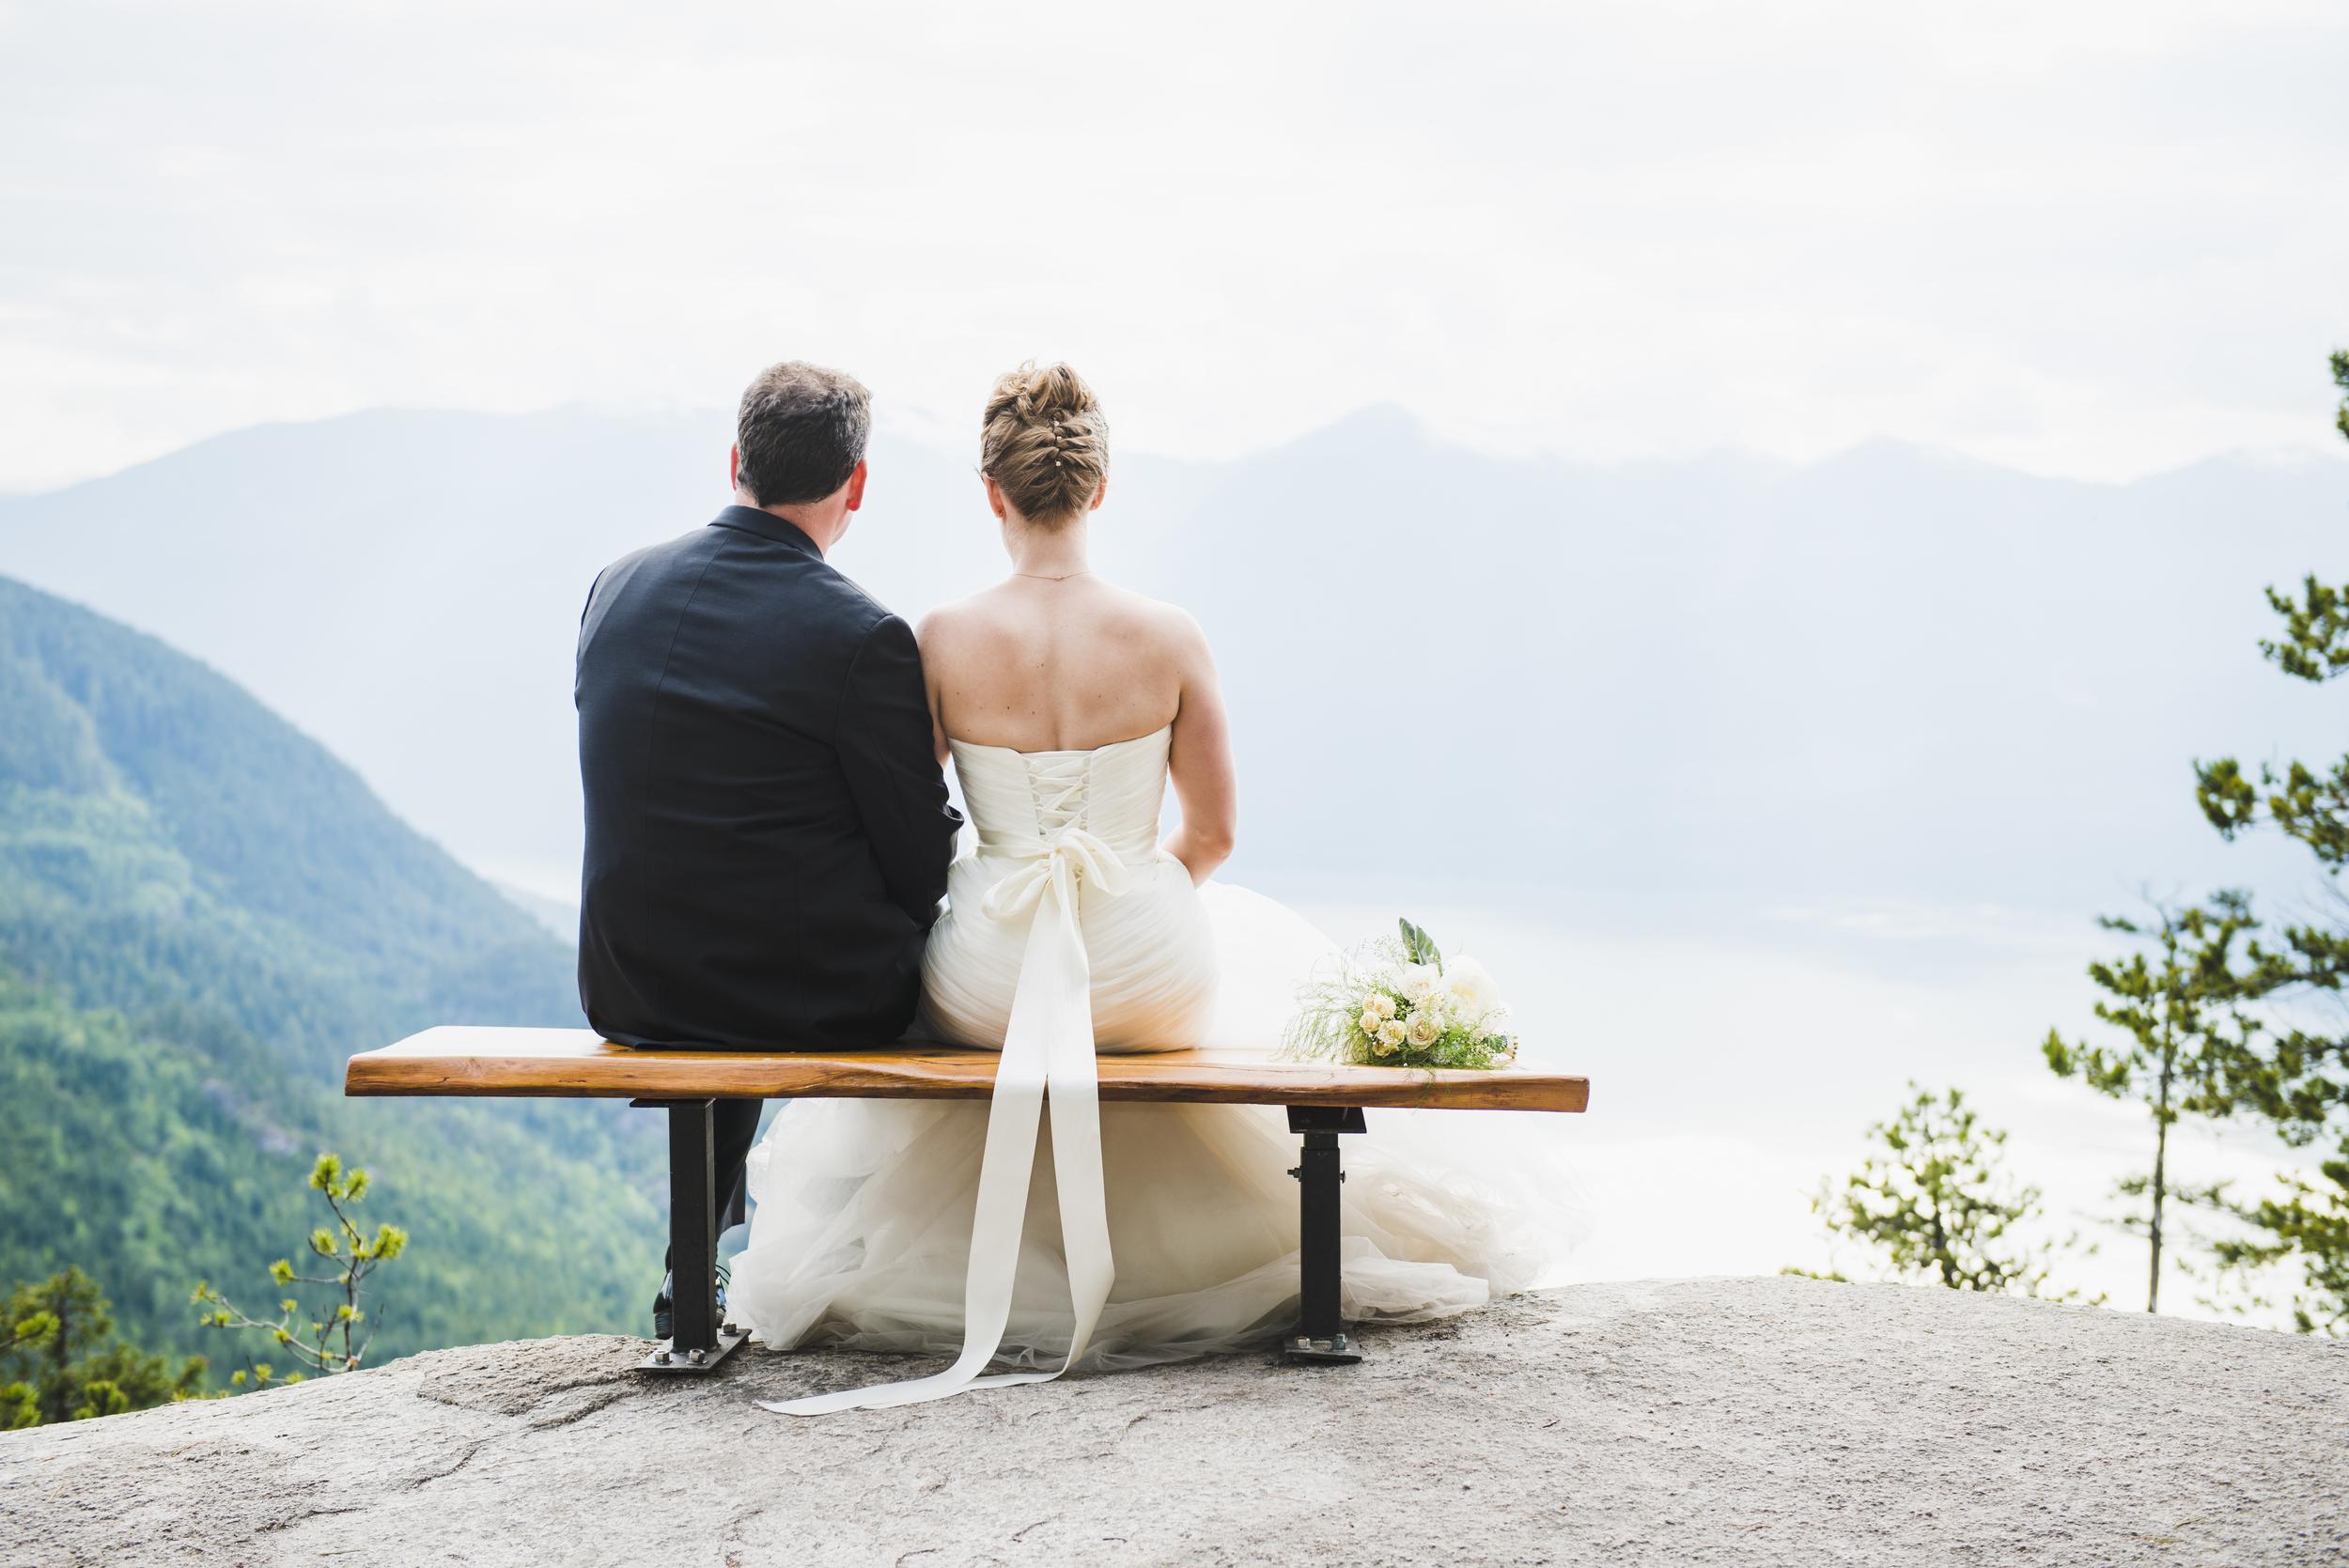 Sea to Sky Gondola, Wedding Photographer